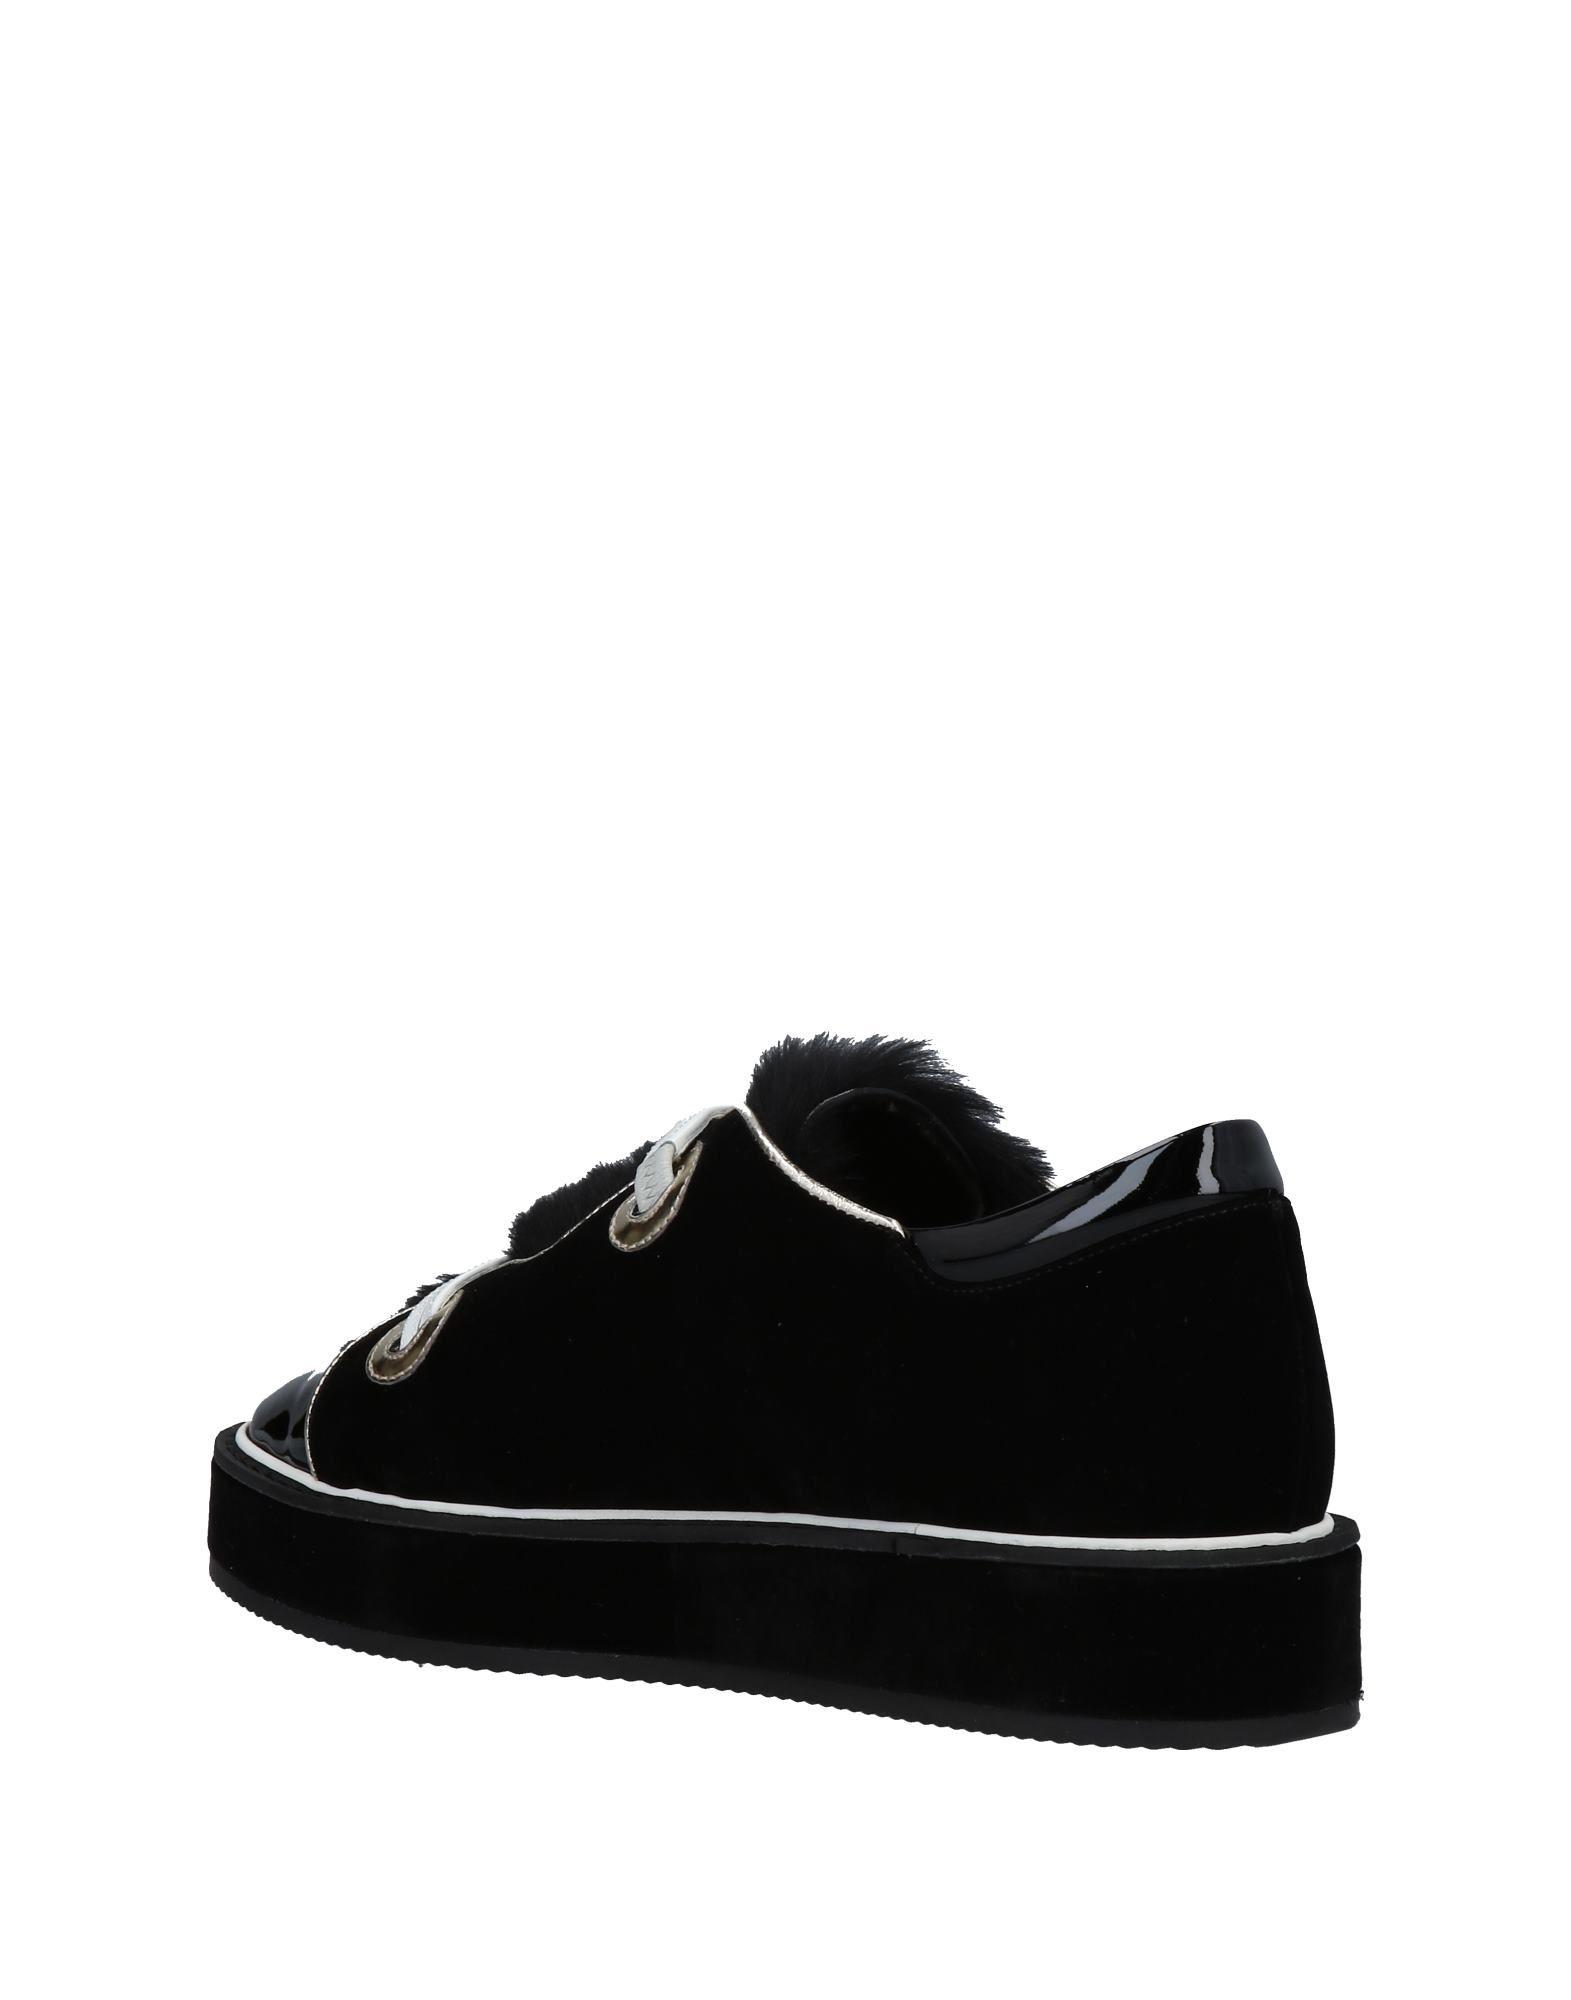 Nicholas Kirkwood Sneakers Damen aussehende  11366549TEGünstige gut aussehende Damen Schuhe 3f377b